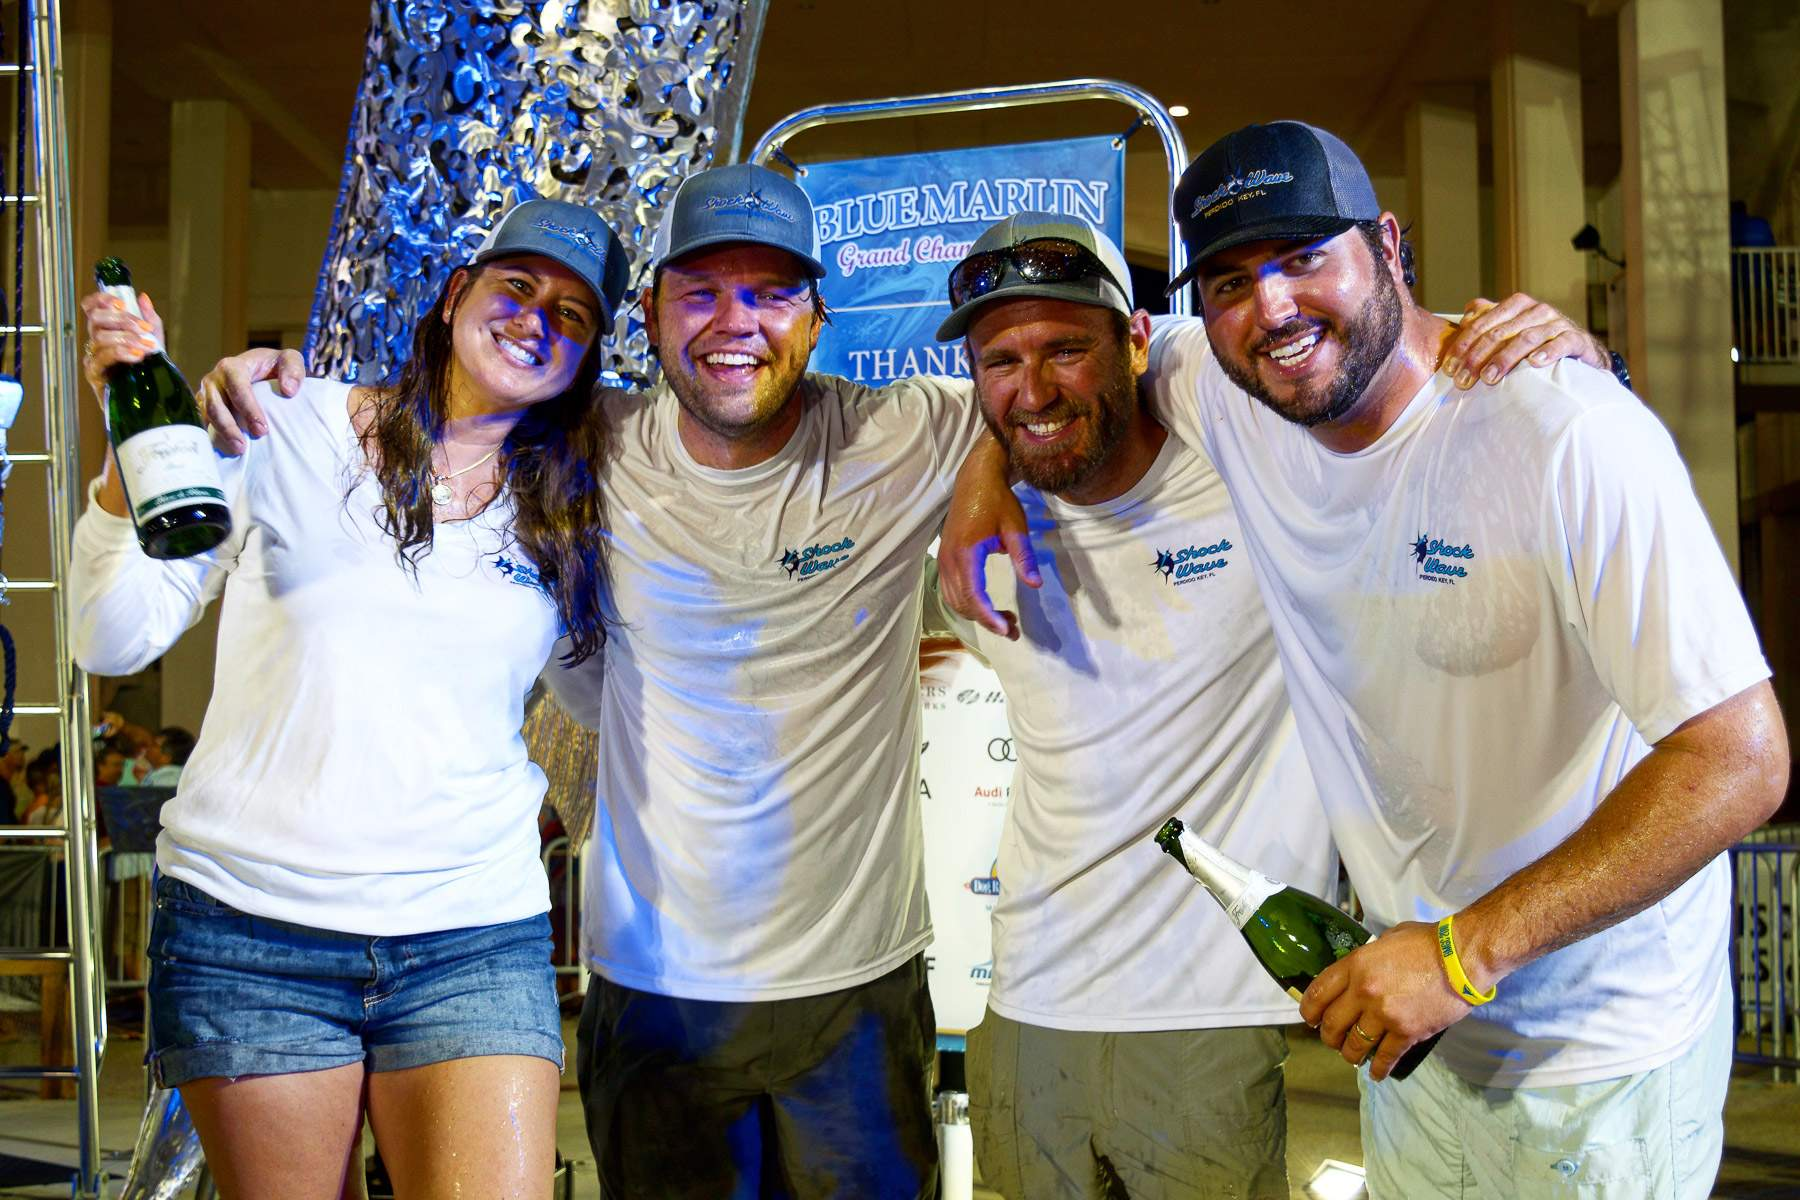 Team Shockwavee 2018 Blue Marlin Grand Champions